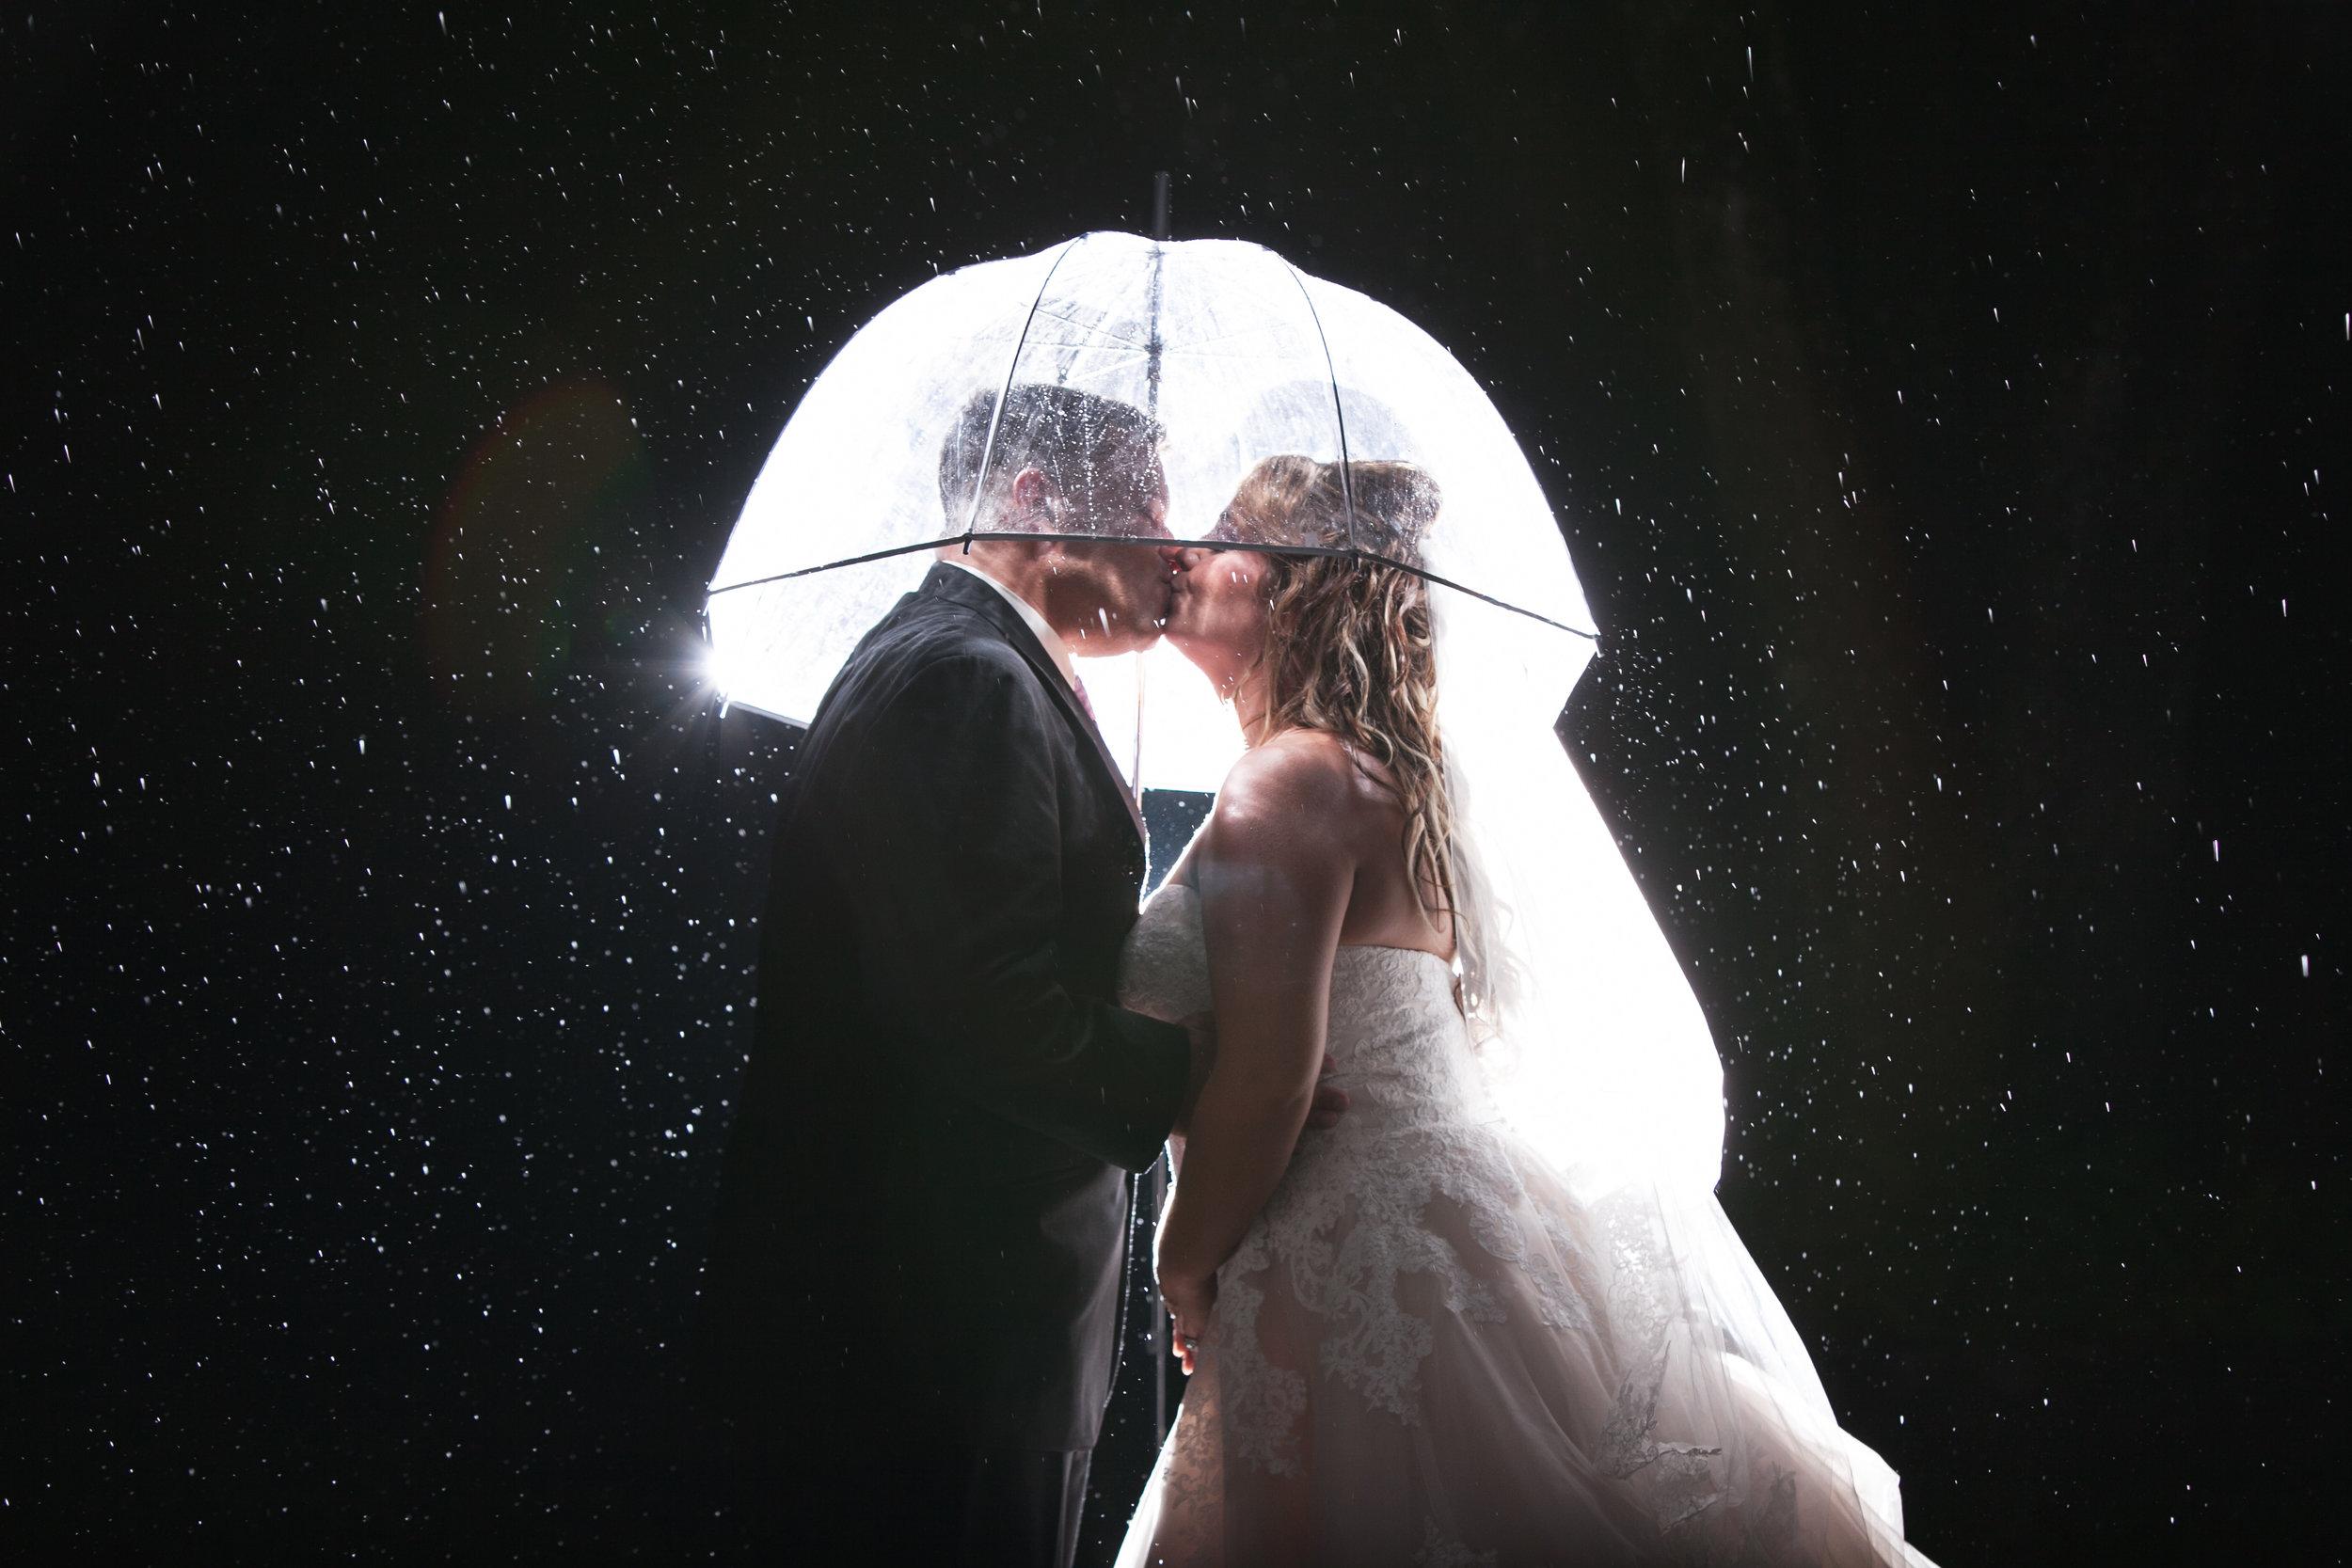 7_25_15 Paul and Amber Lange Farm Wedding 0801.jpg